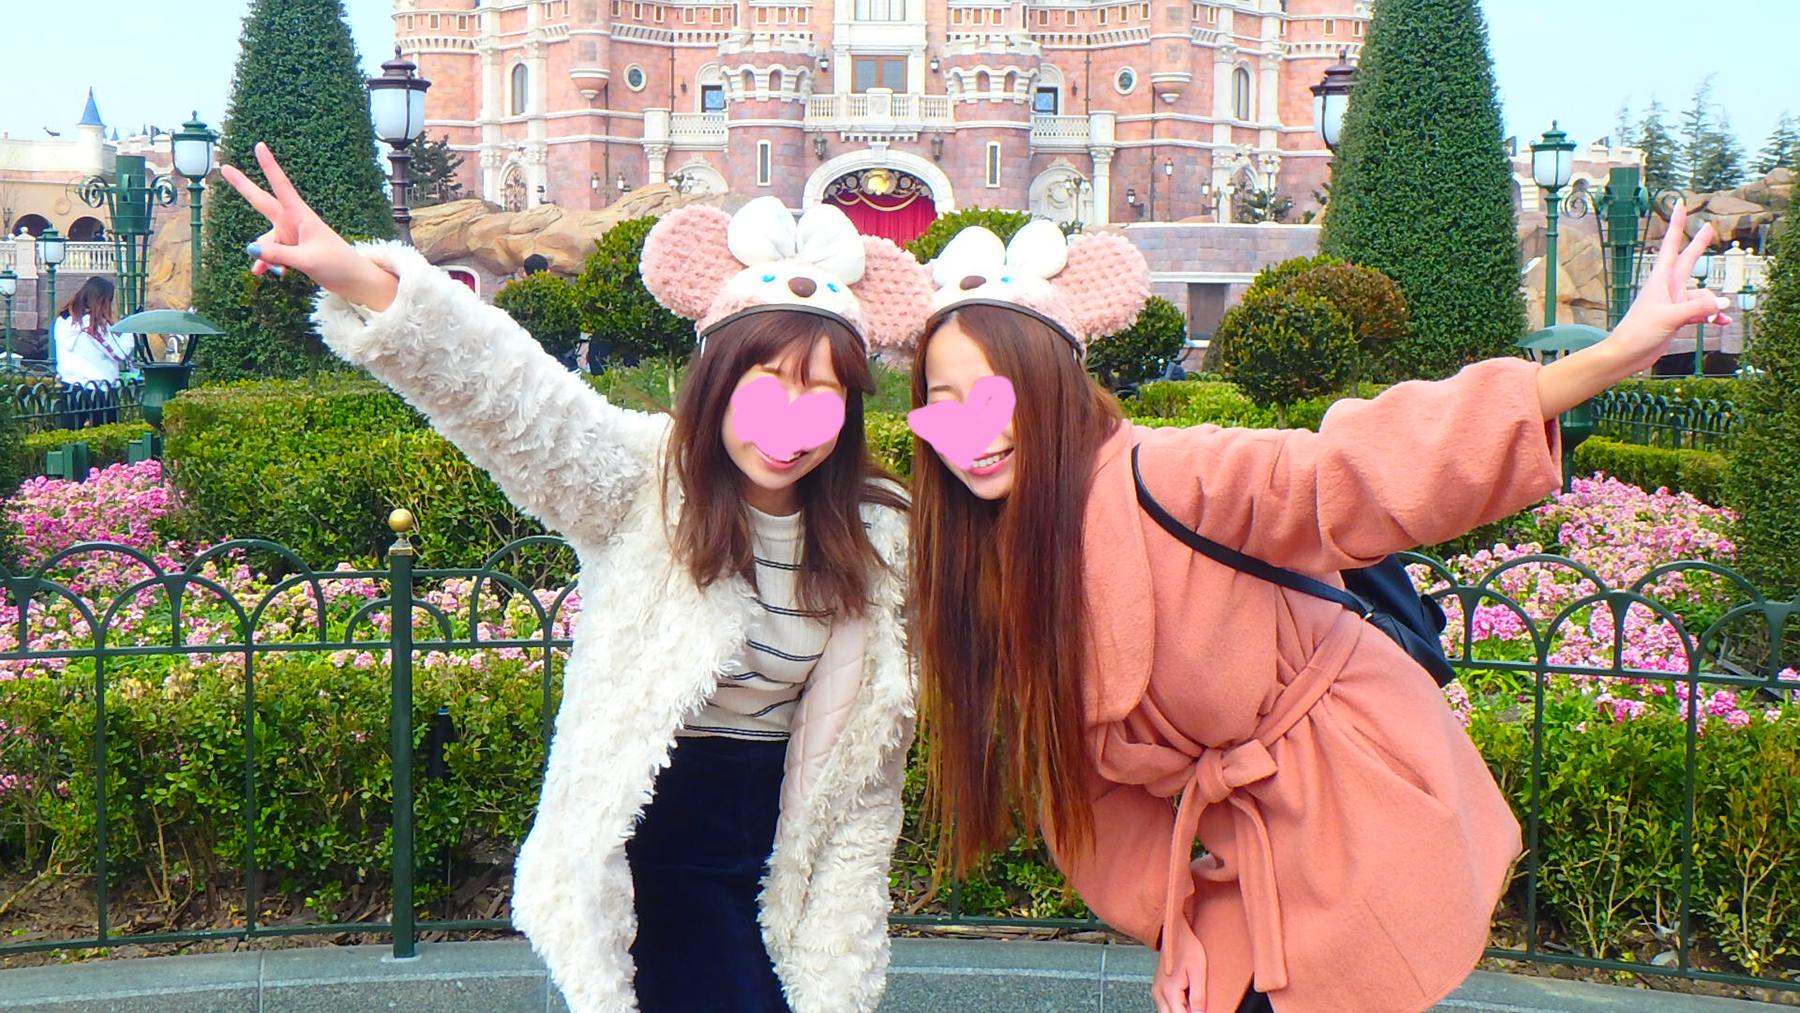 上海旅行 ブログ 女子